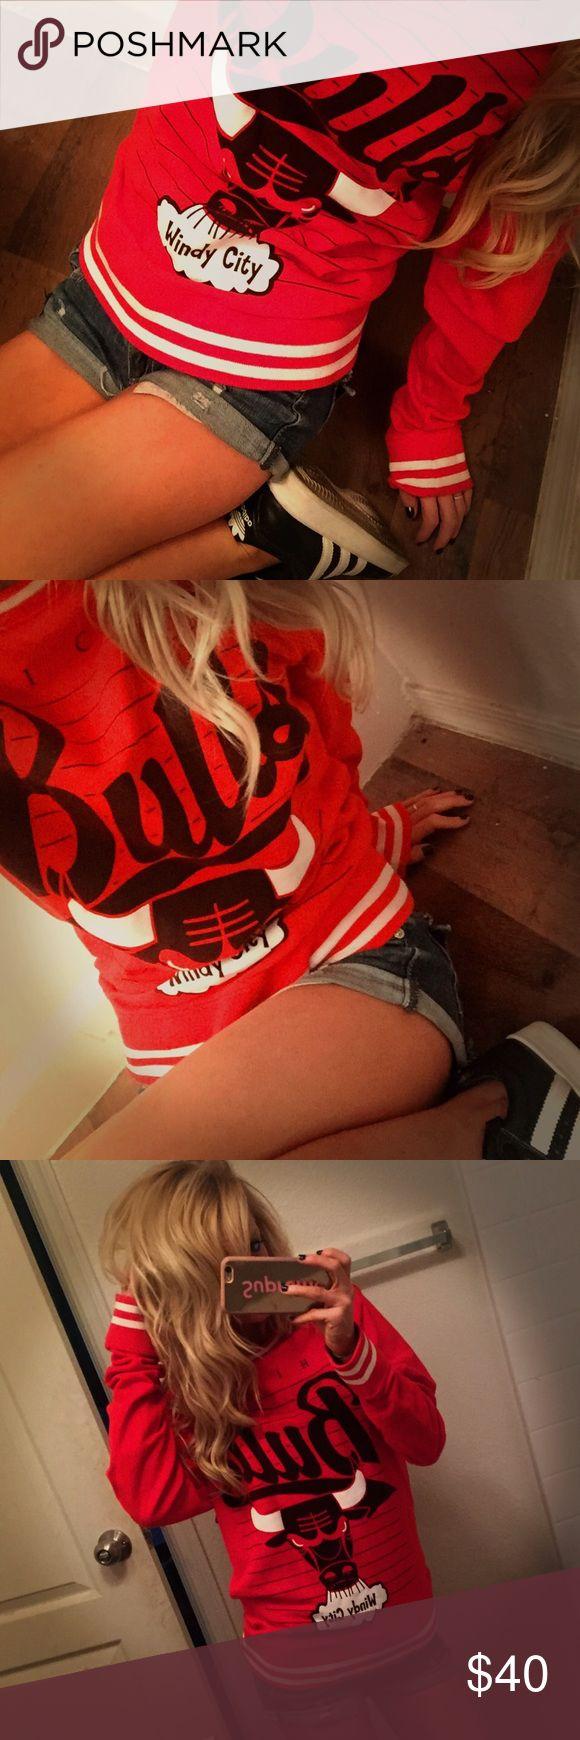 🏀 Chicago Bulls Sweatshirt Size small. Long sleeve. Pull over Sweatshirt. Chicago bulls basketball. Windy City. Red, scoop neck. Good condition chicago bulls Tops Sweatshirts & Hoodies